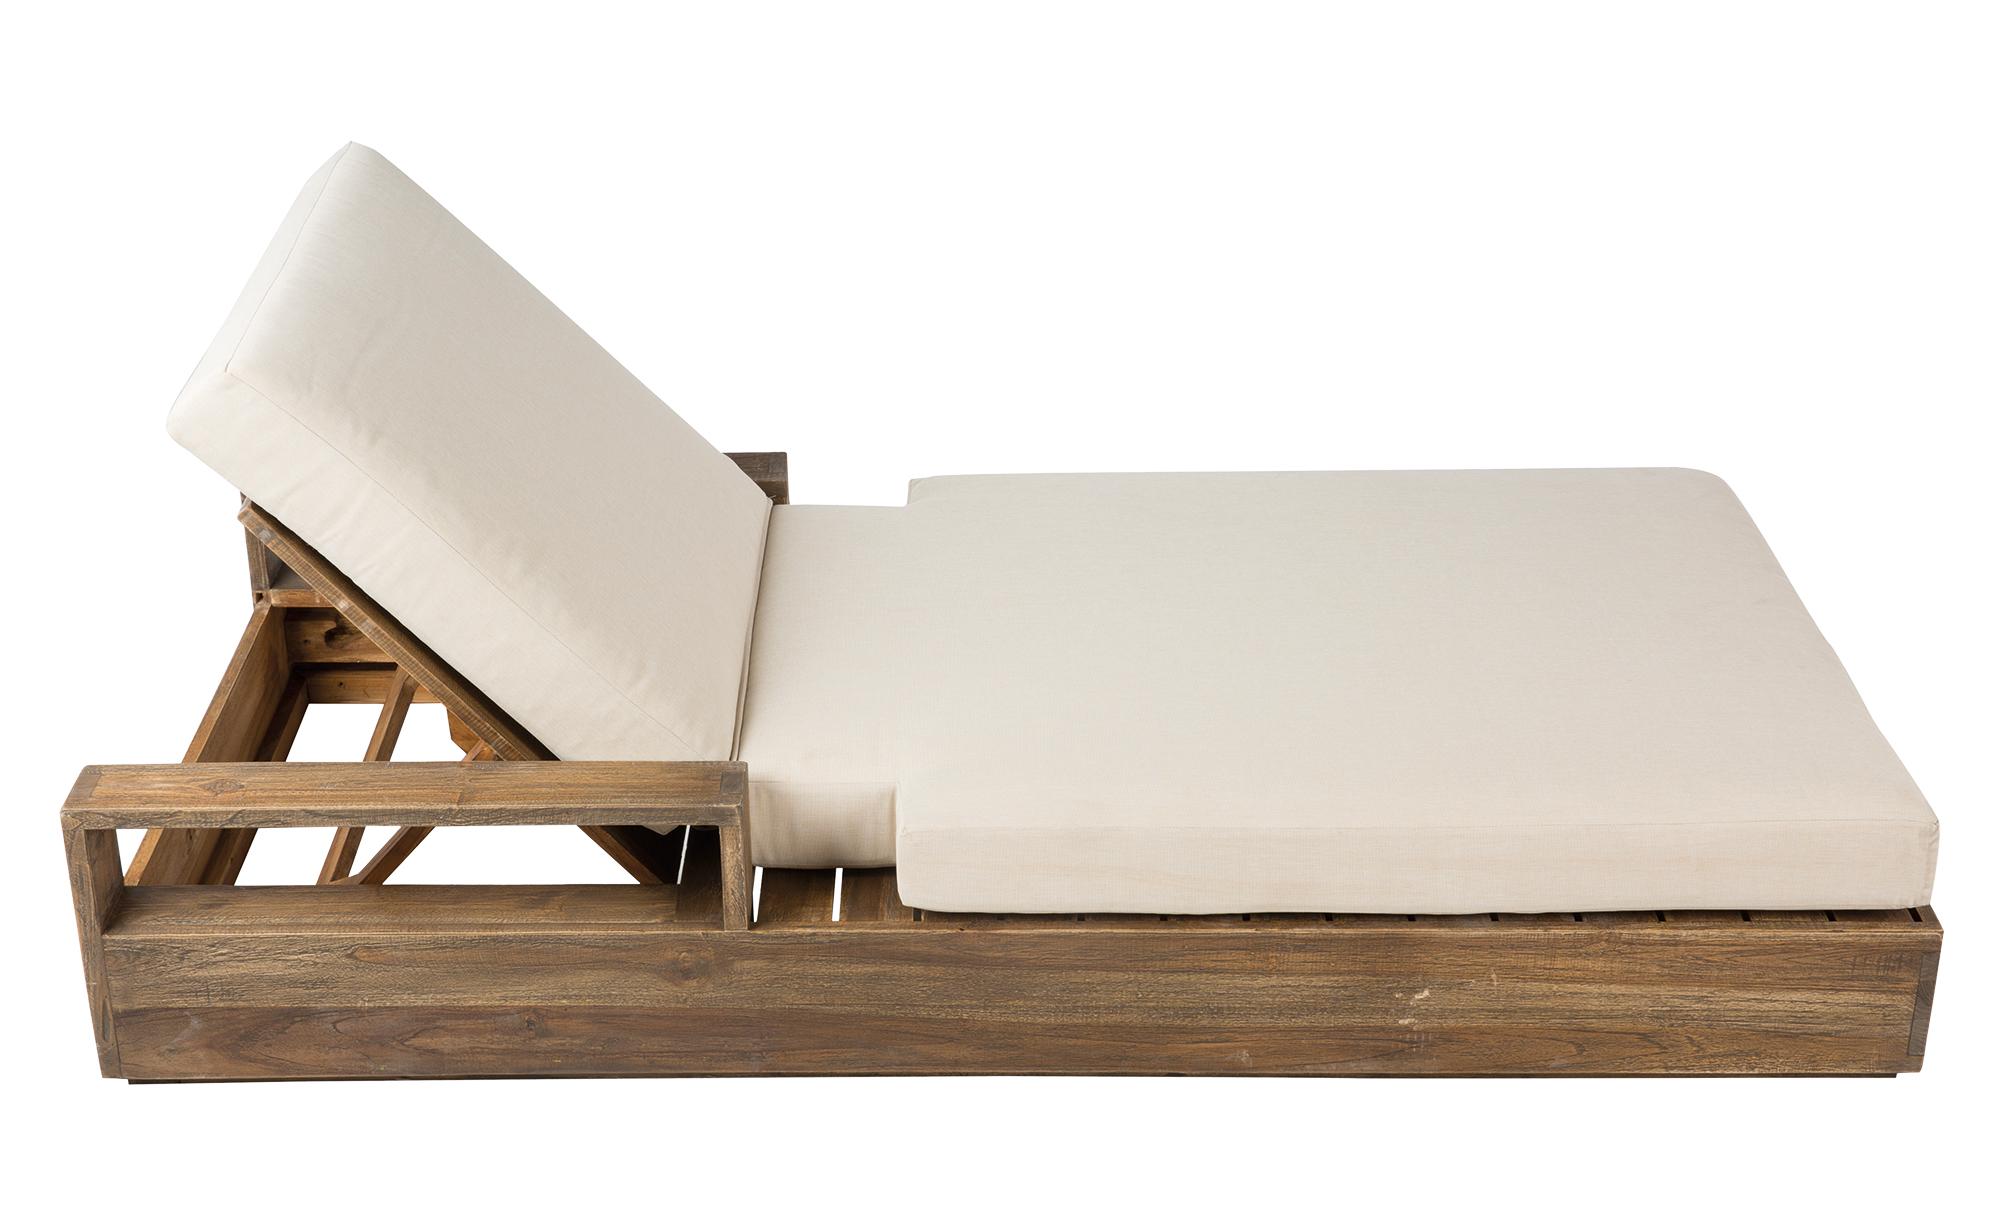 tumbona de madera con colchoneta blanca - Tumbonas Madera